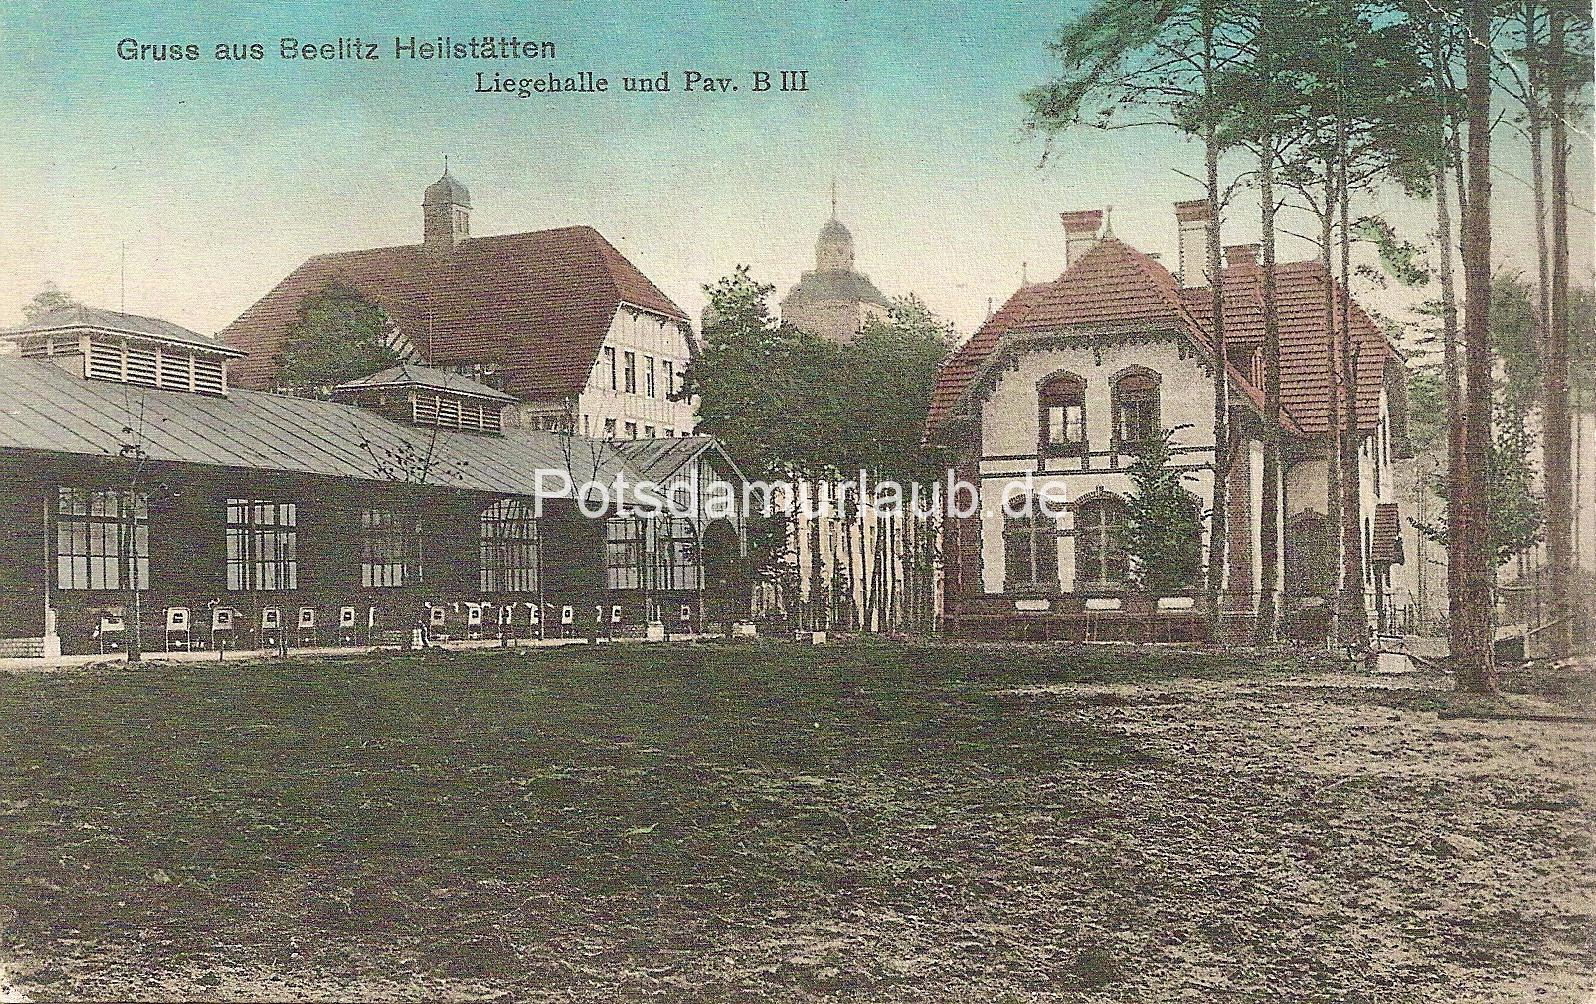 1911 10 30 v